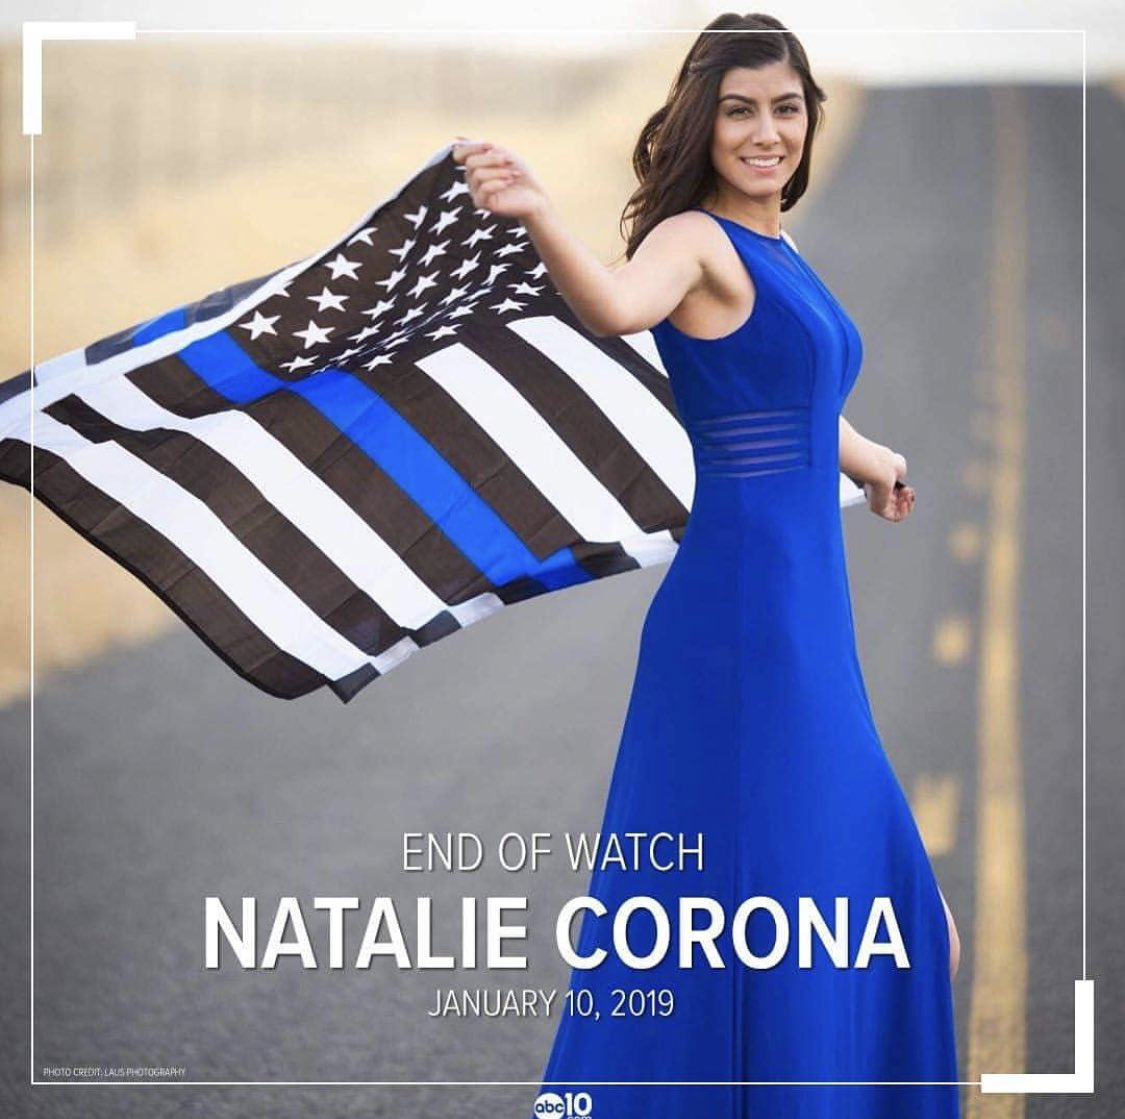 lαtín príncє's photo on #NatalieCorona